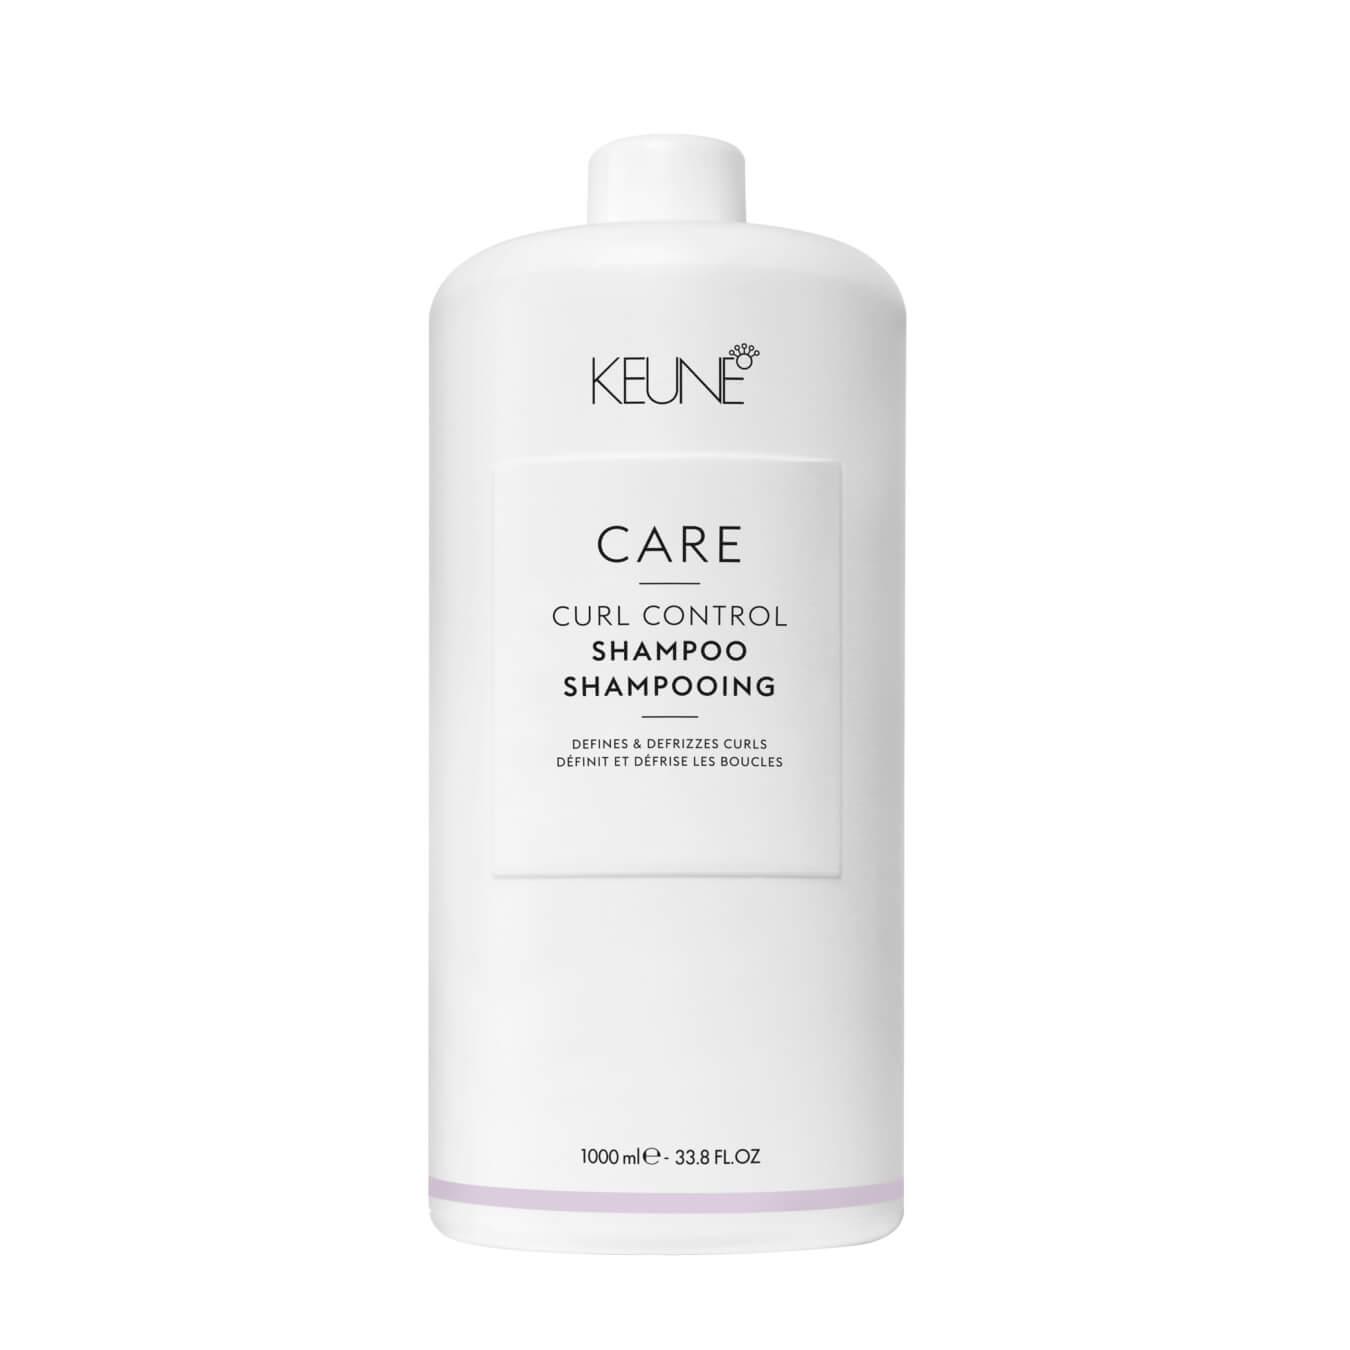 Kauf Keune Care Curl Control Shampoo 1000ml